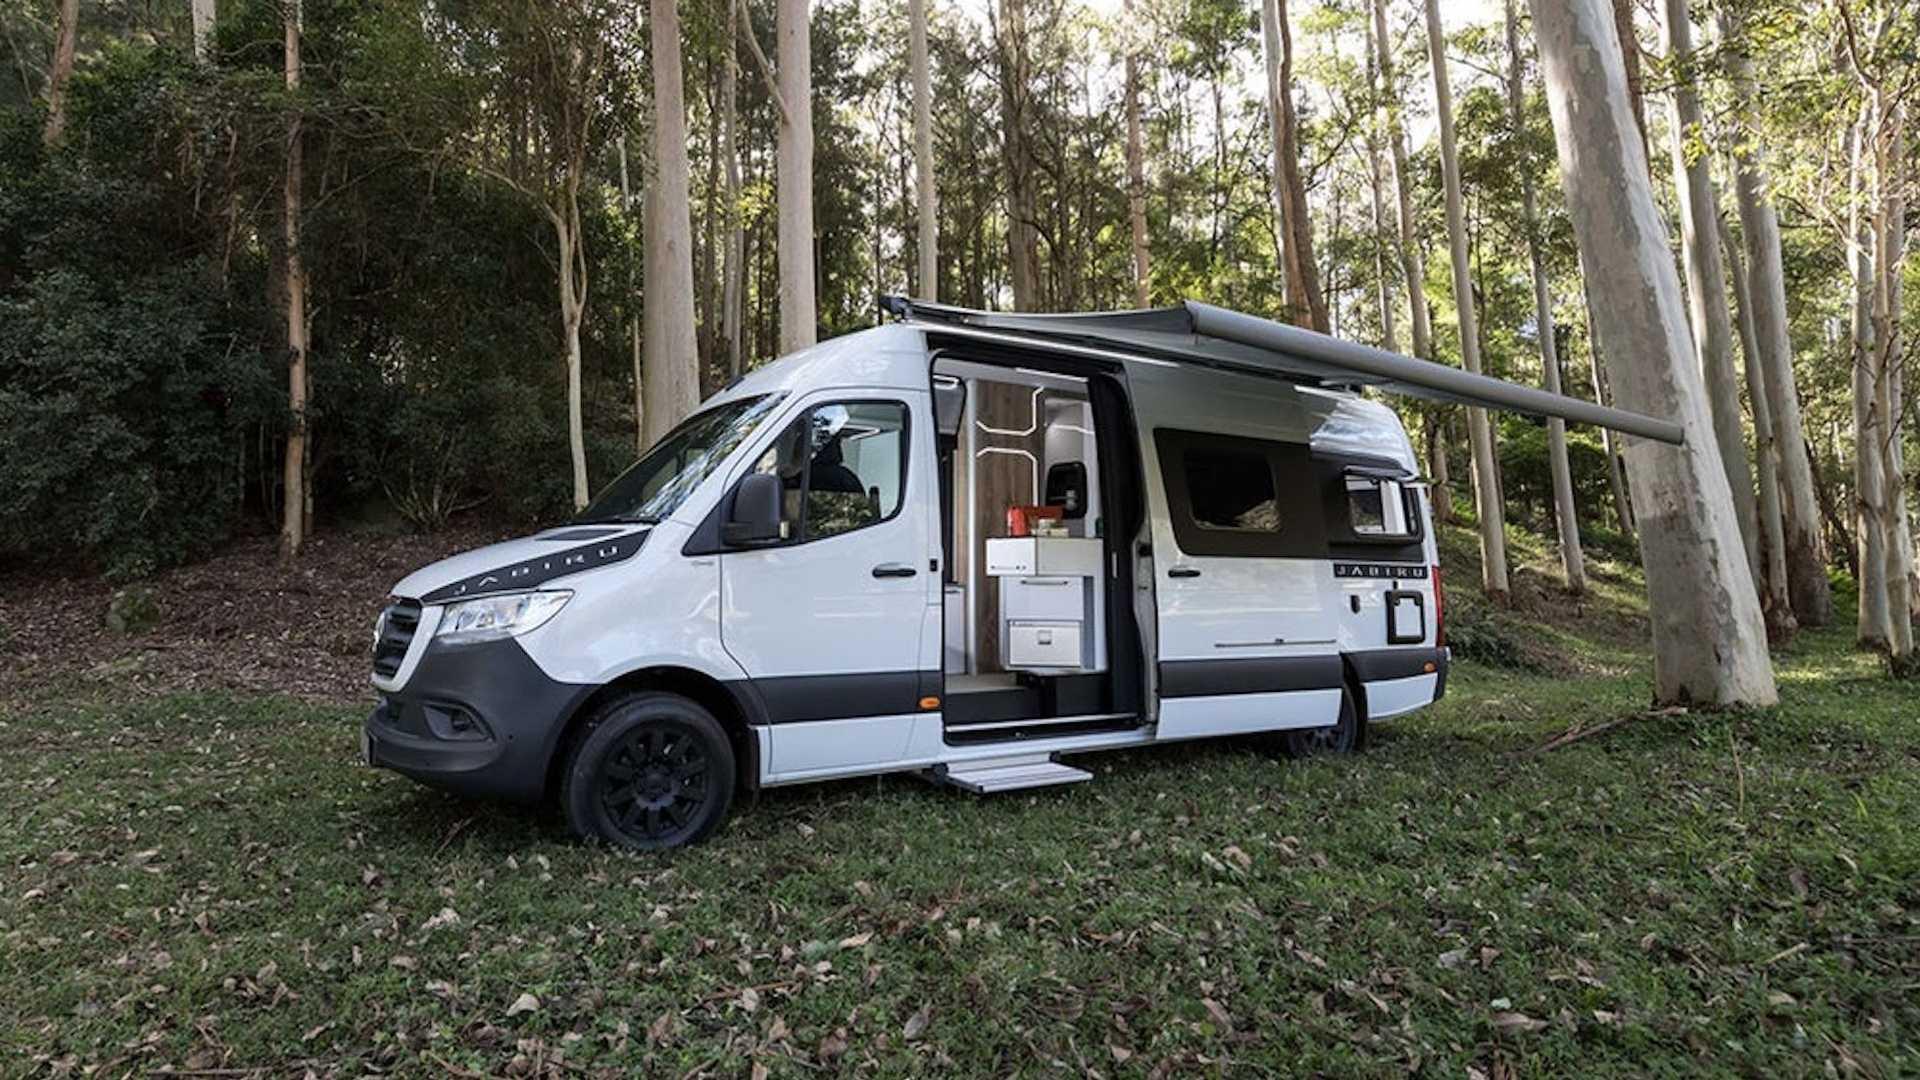 Mercedes-Benz Sprinter превратили в «дом на колесах» 1